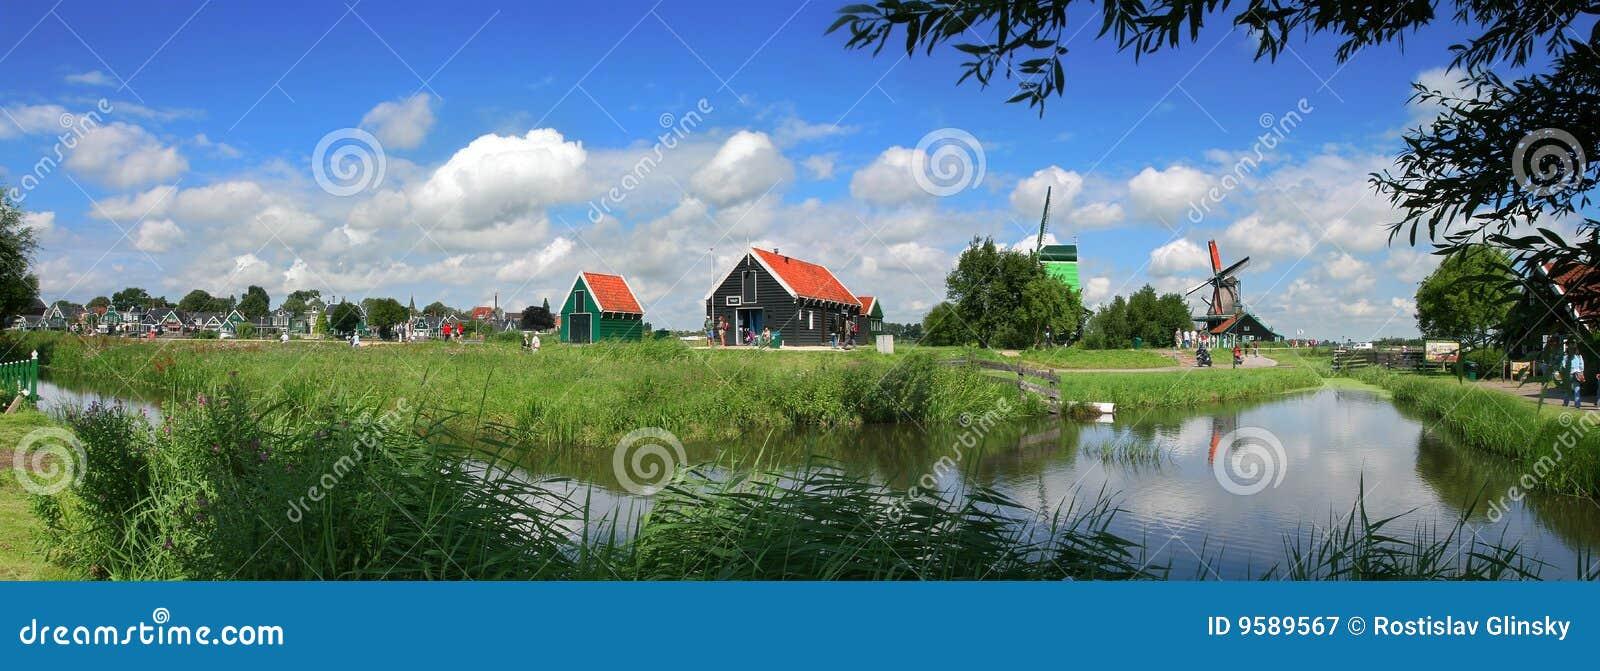 Villaggio olandese.